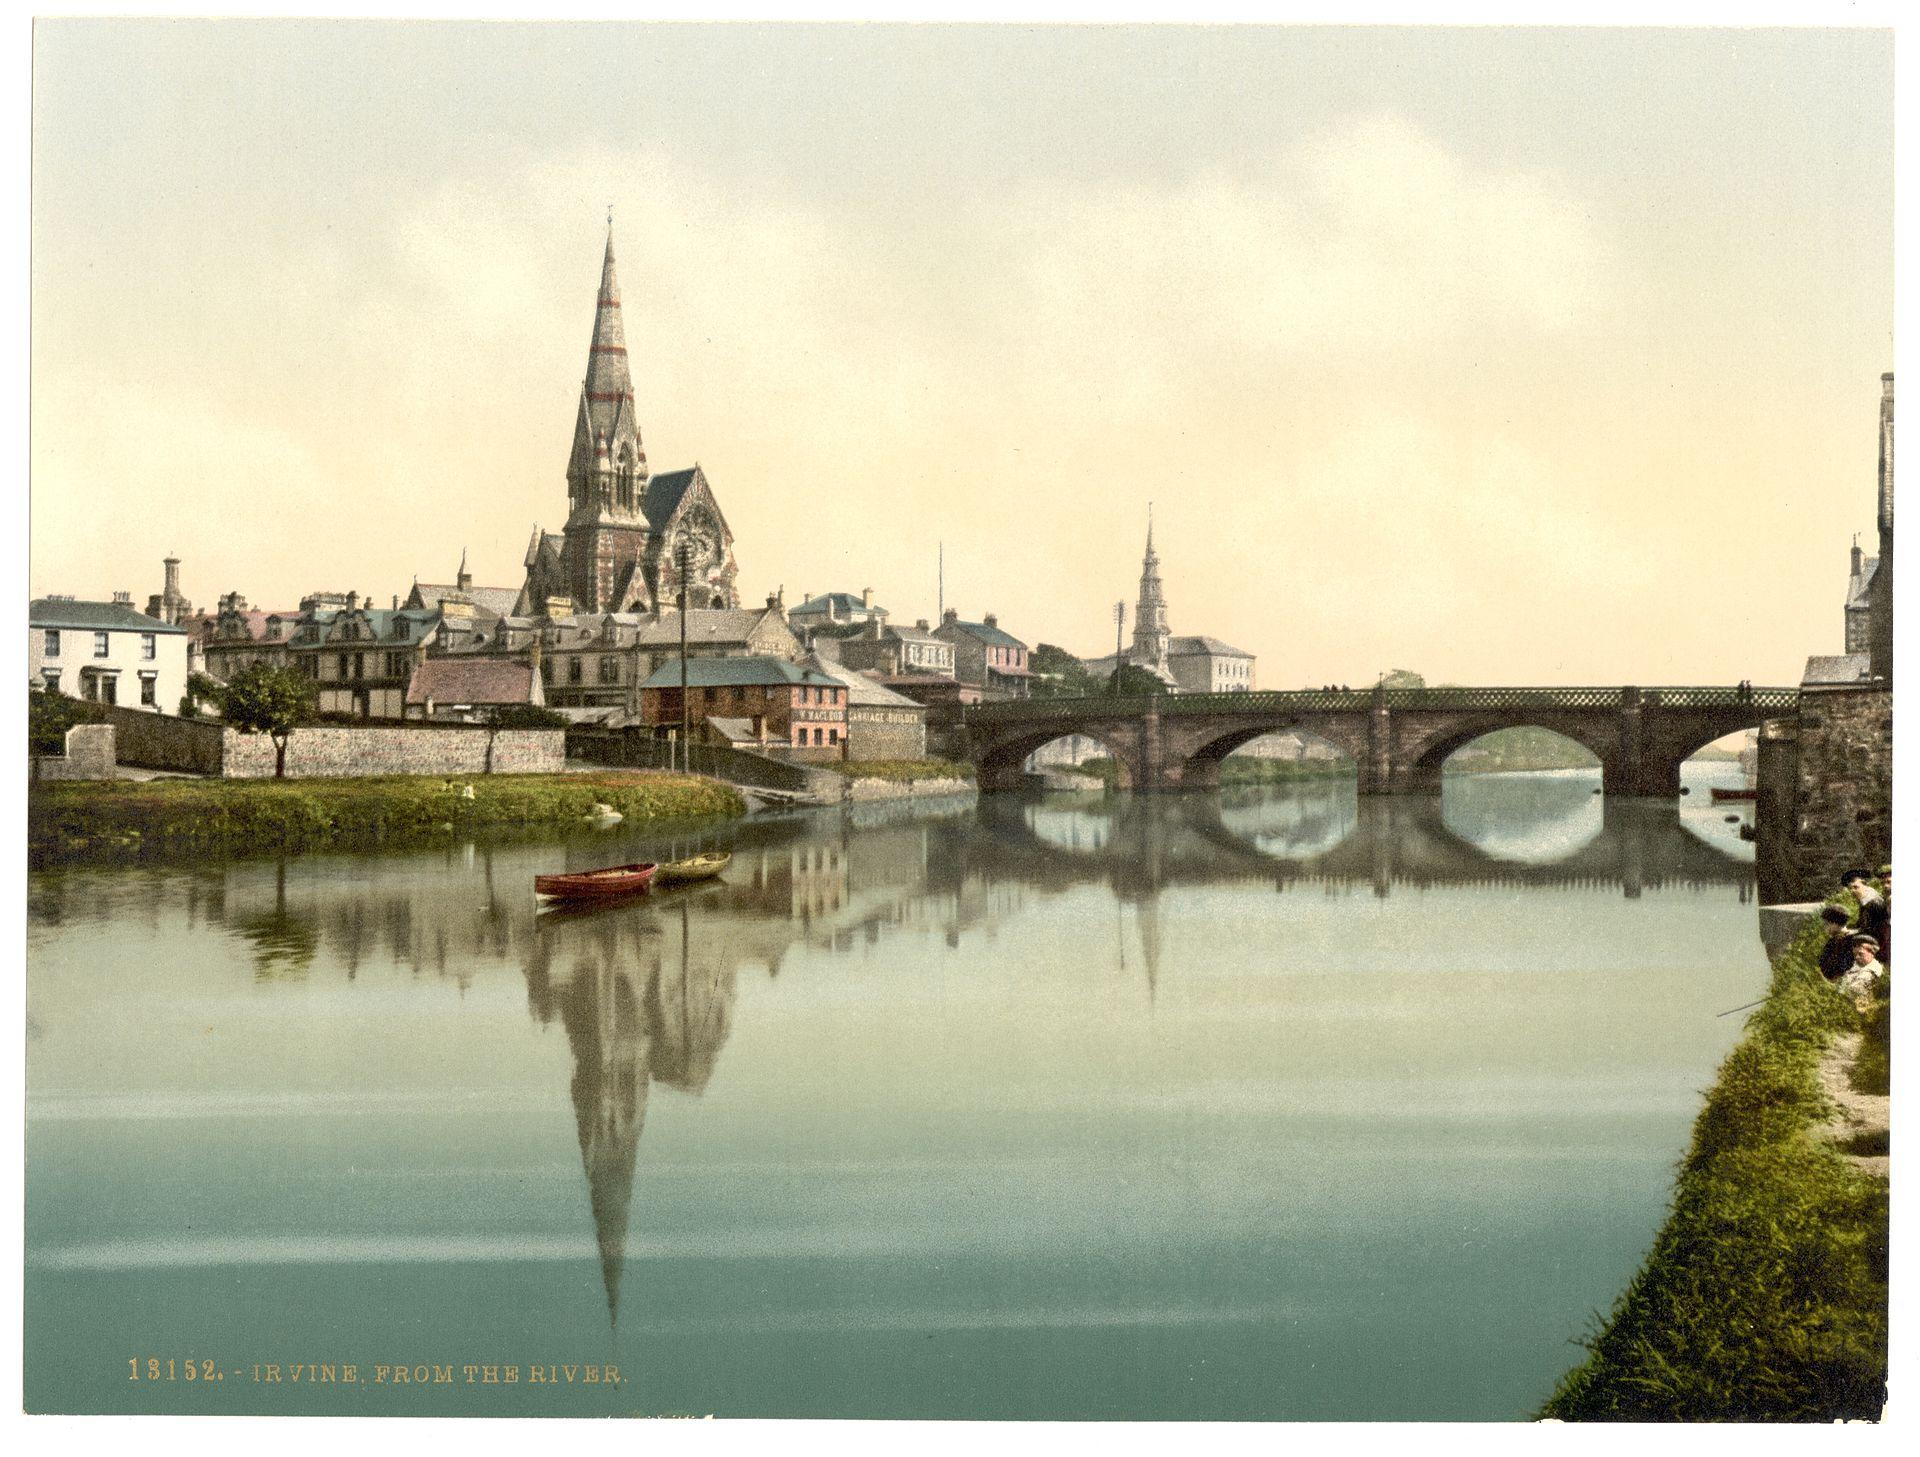 Irvine_from_the_river,_Scotland-LCCN2001706027.jpg